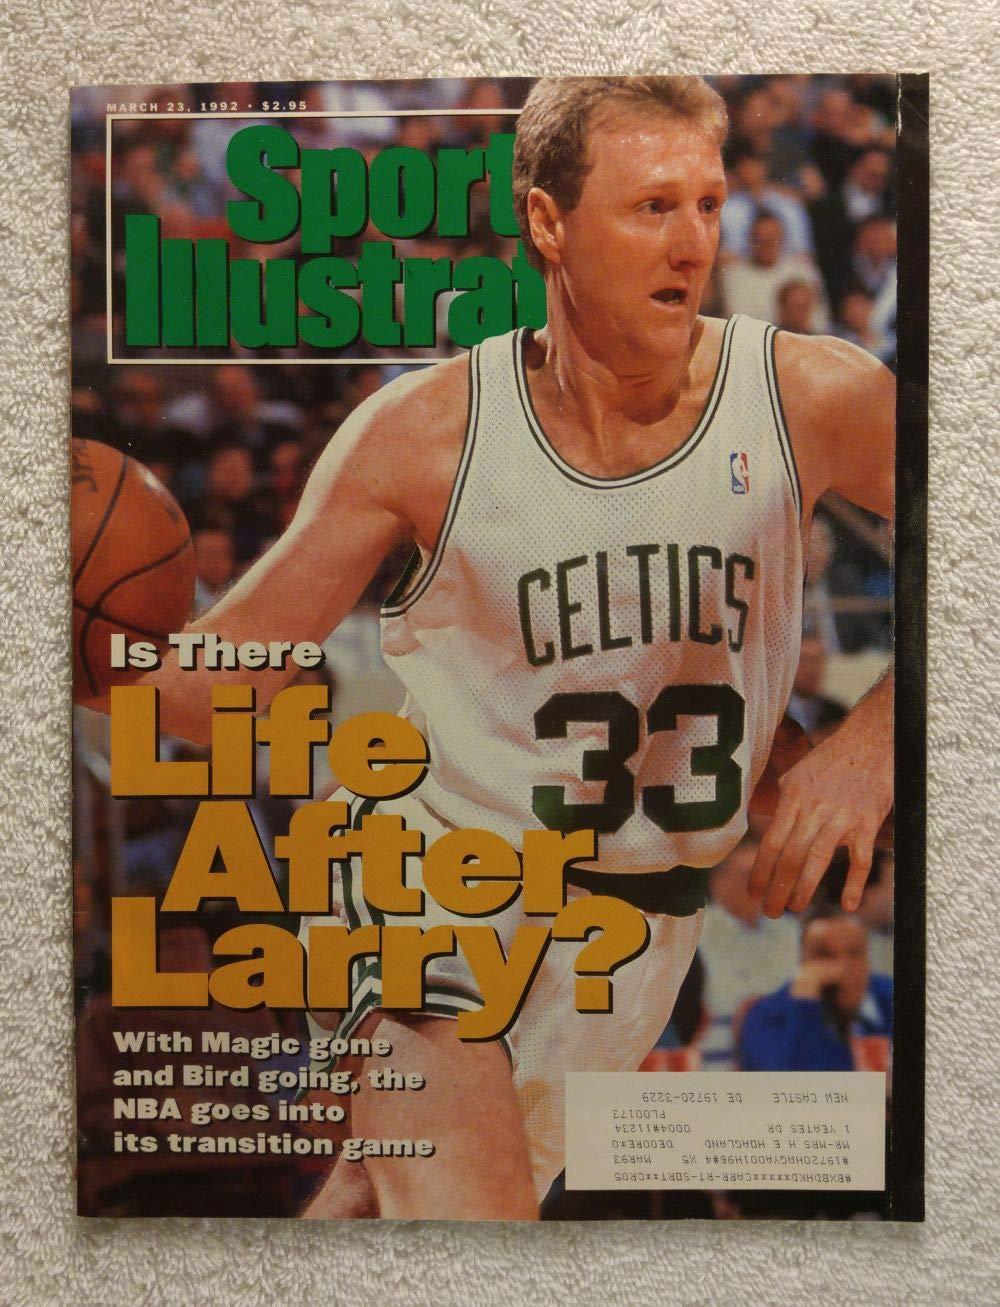 68a2c5944ec22 Larry Bird - Boston Celtics - Sports Illustrated - March 23, 1992 ...